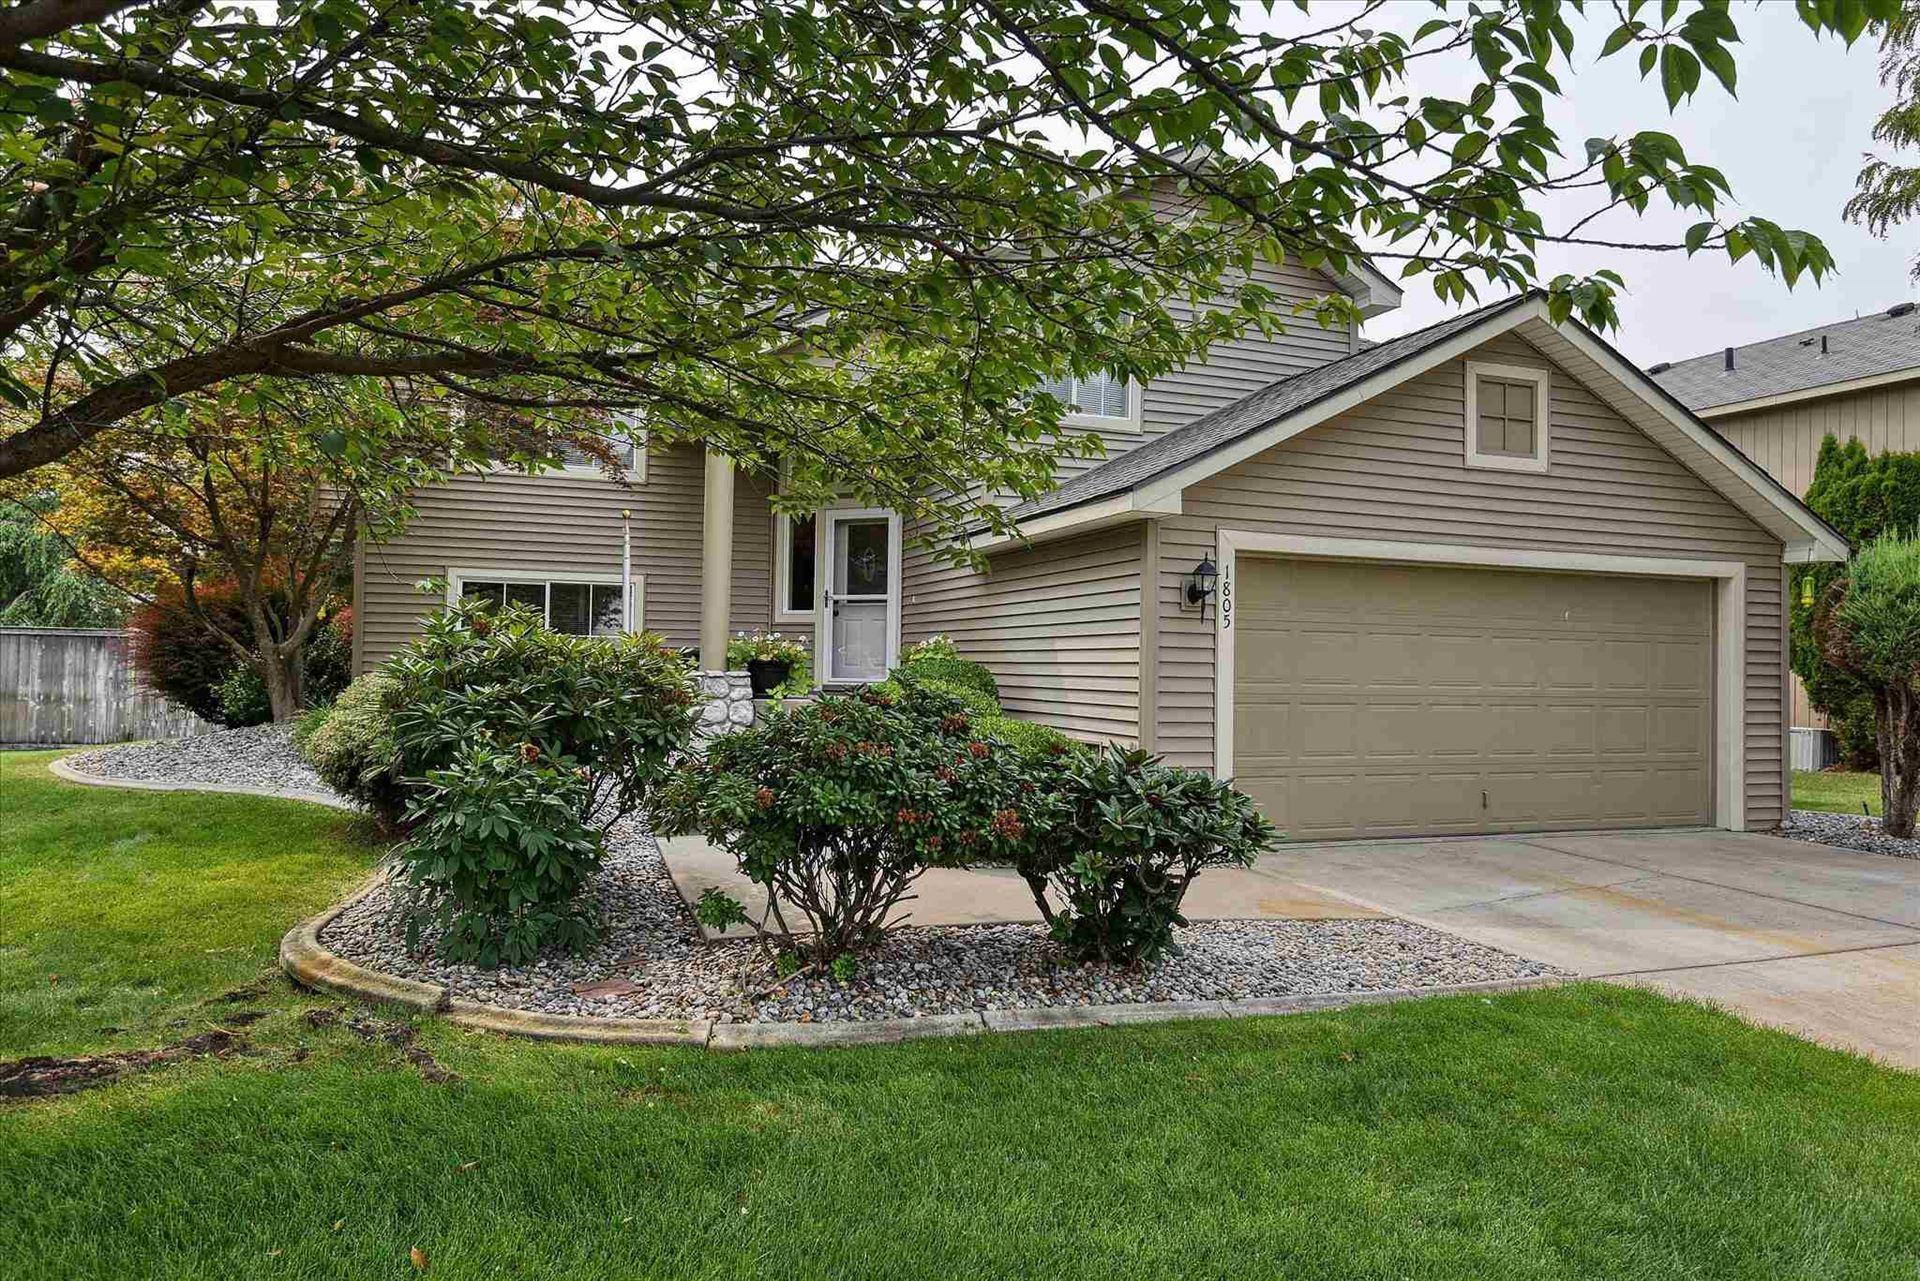 1805 N Harmony Ln, Spokane Valley, WA 99016-8782 - #: 202121218